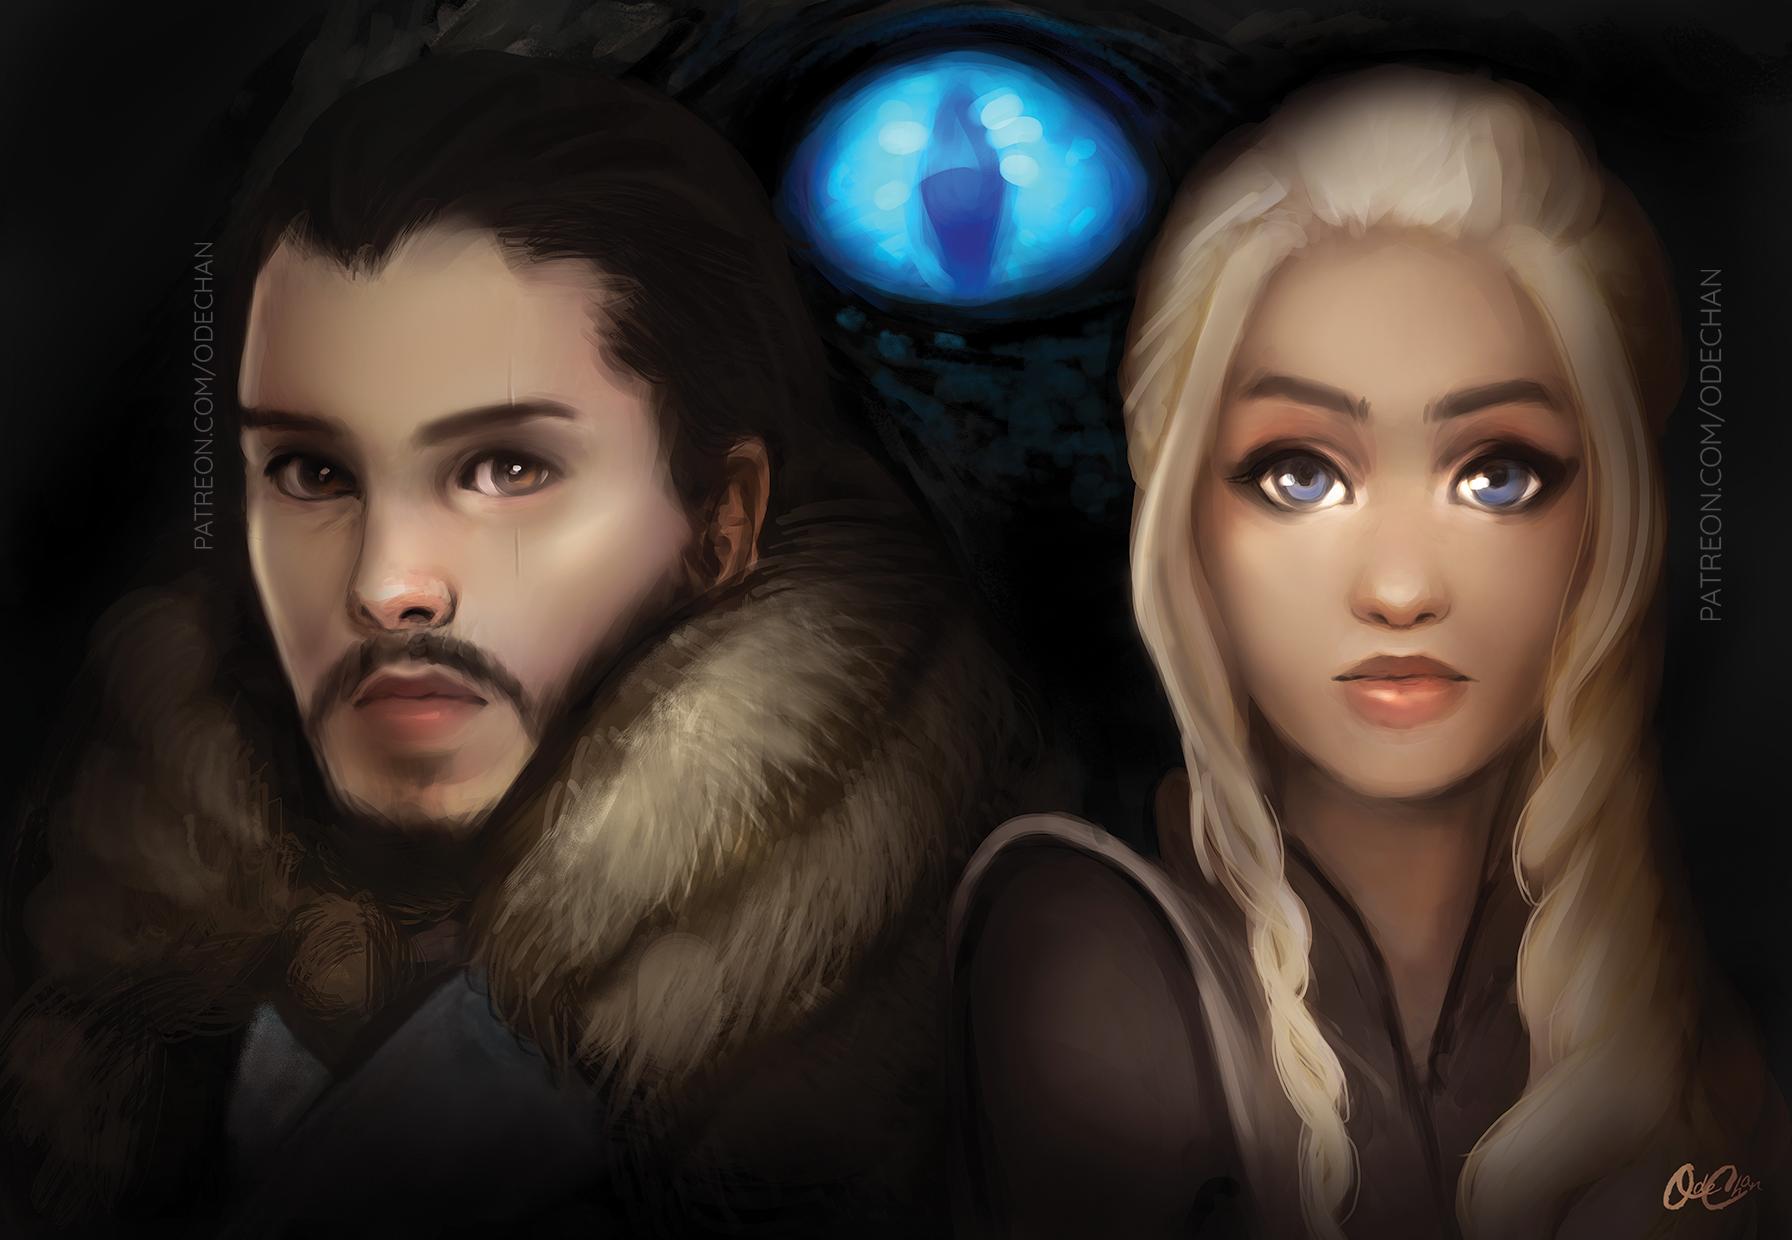 Game of Thrones: Jon Snow and Daenerys Targaryen